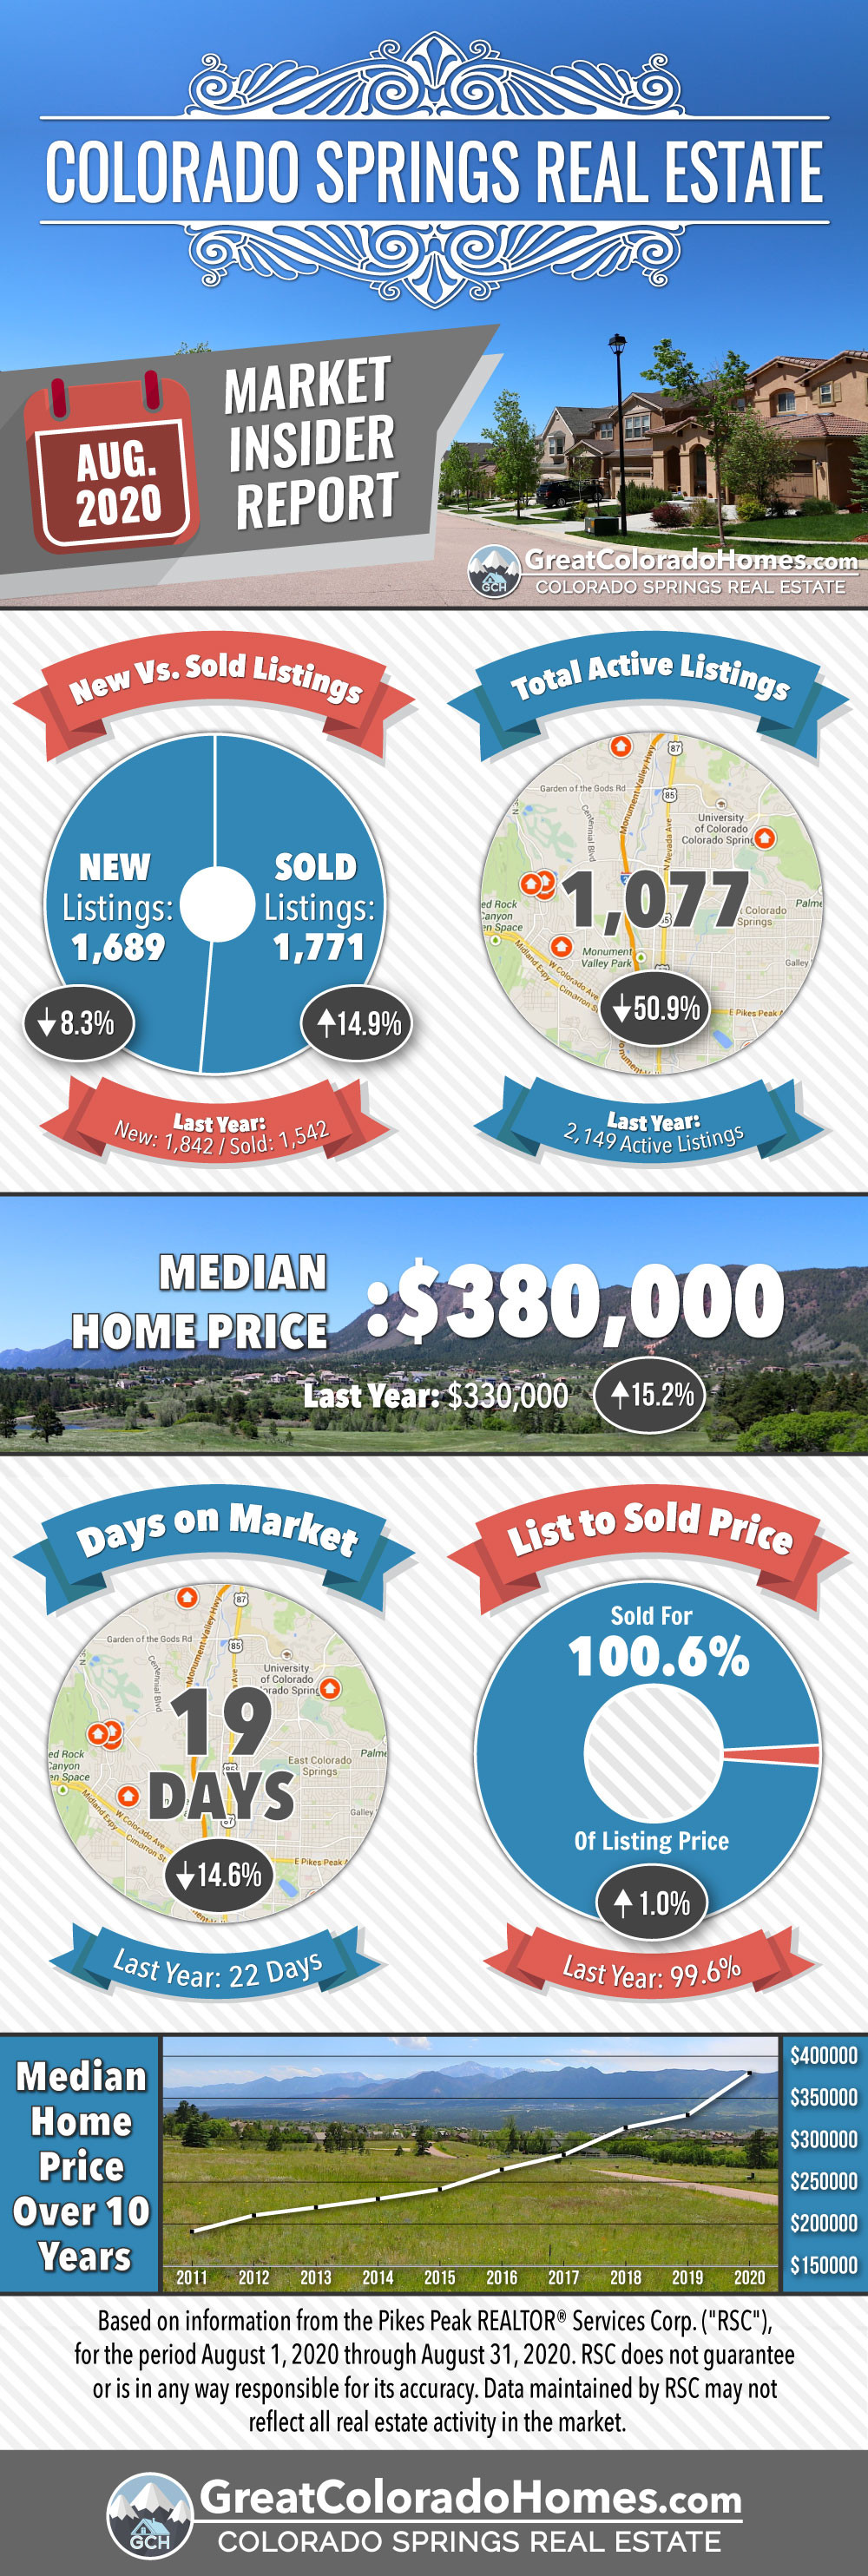 August 2020 Colorado Springs Real Estate Market Statistics Infographic